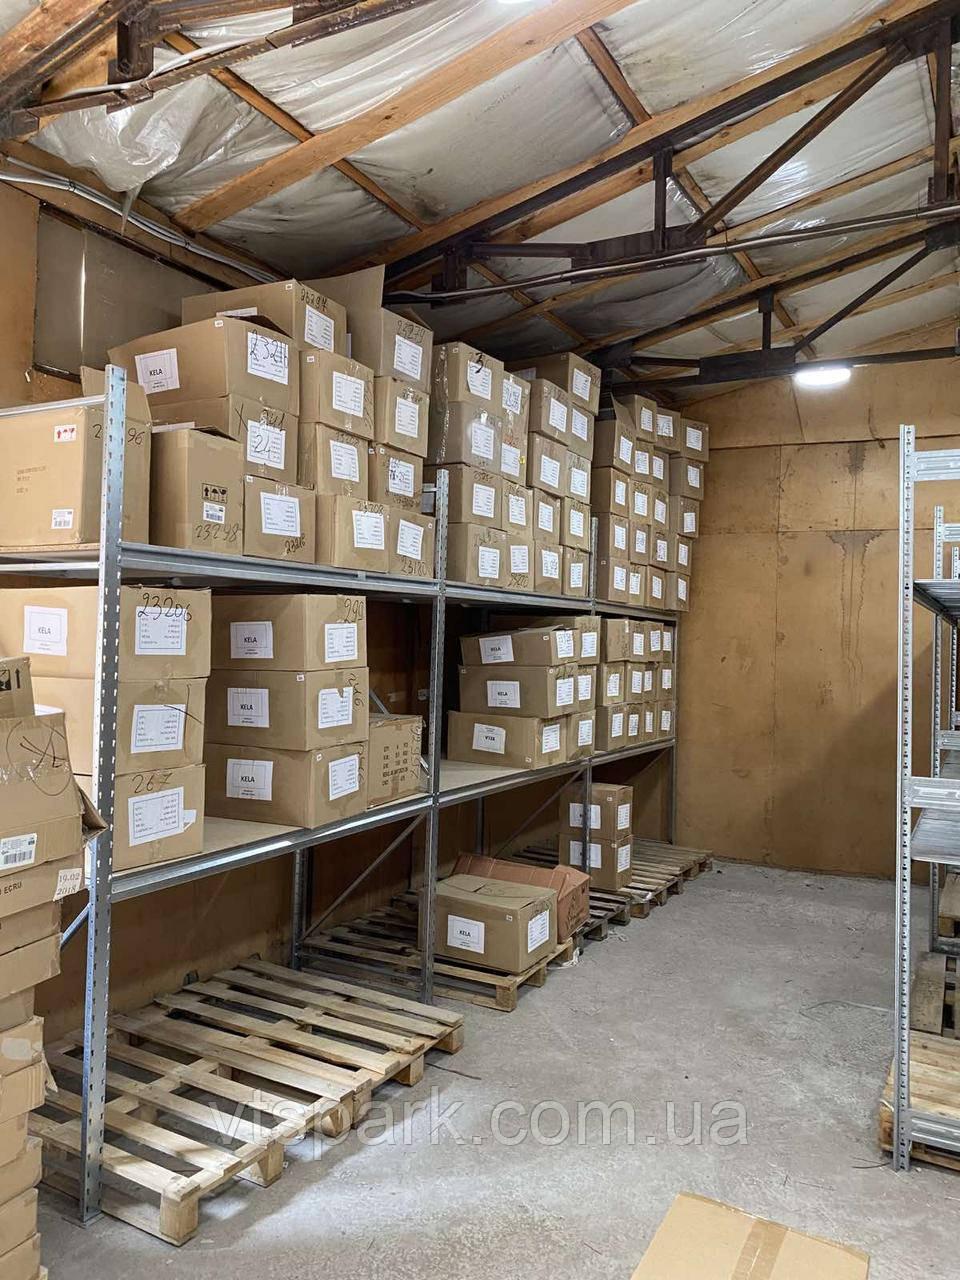 Стеллаж полочный оцинкованный 2000х2006х500 мм, 700кг на полку 2 полки с ДСП 16мм для гаража, склада, магазина